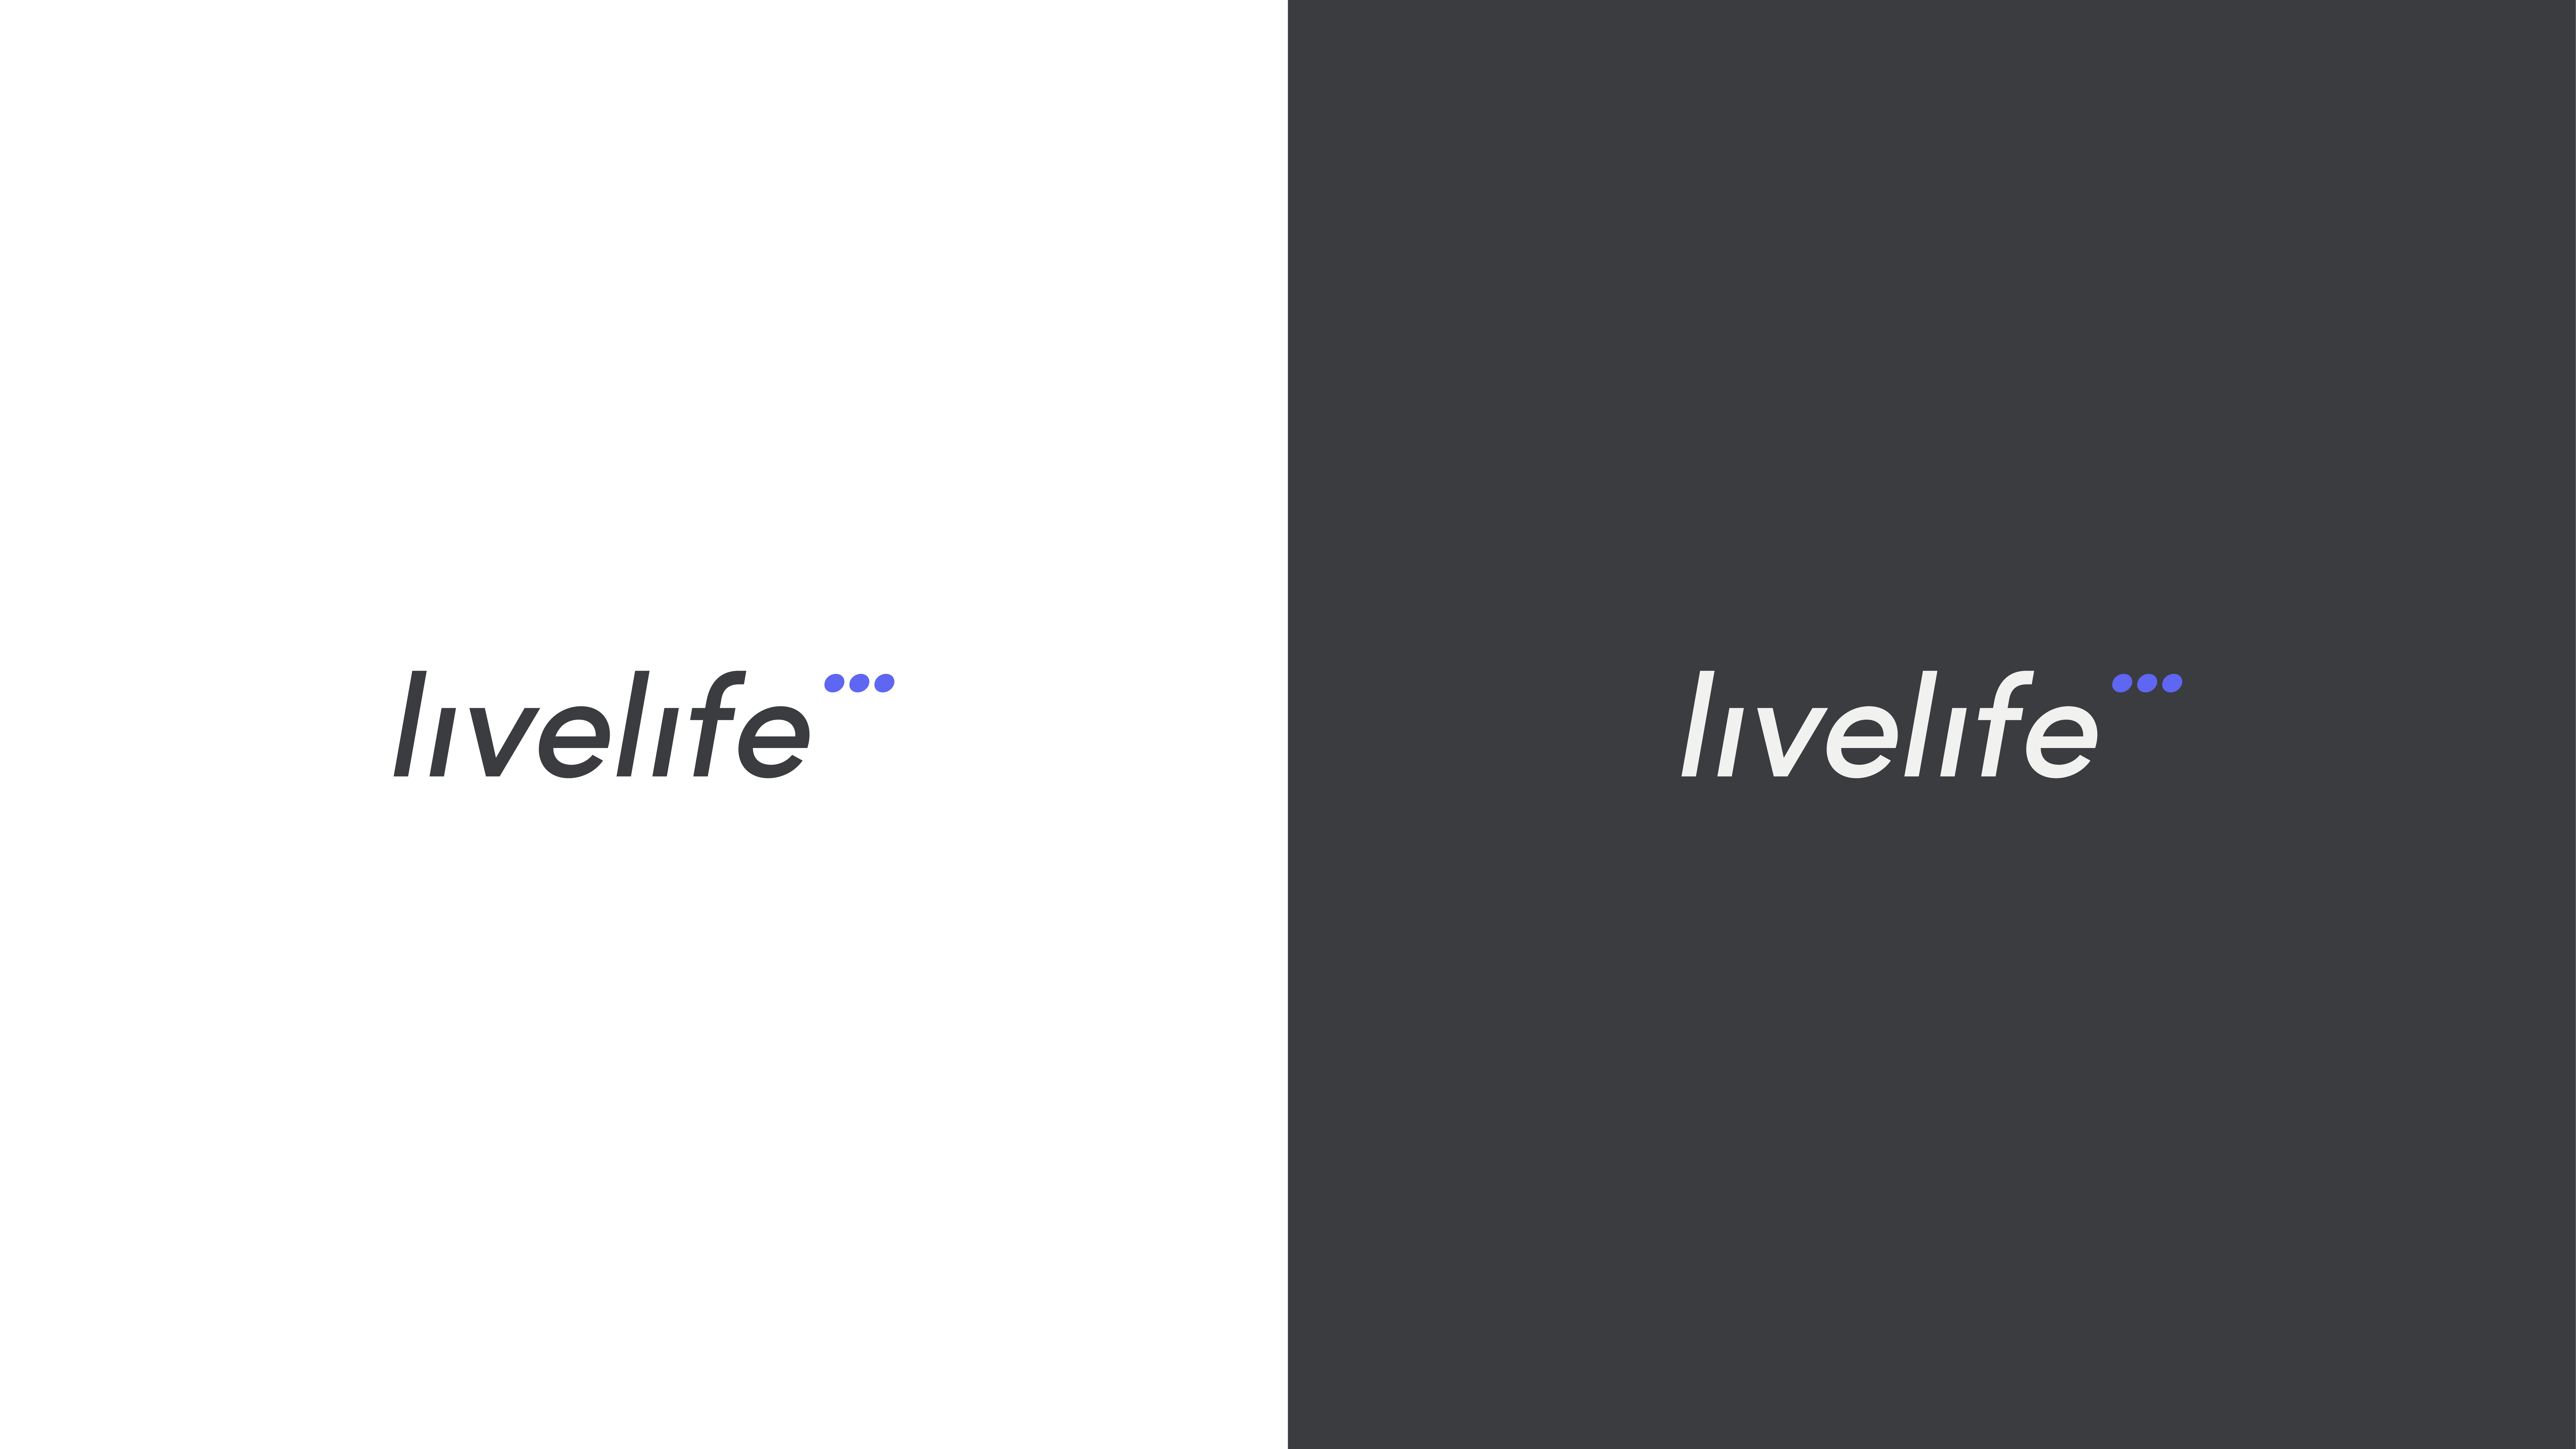 livelife 04 1